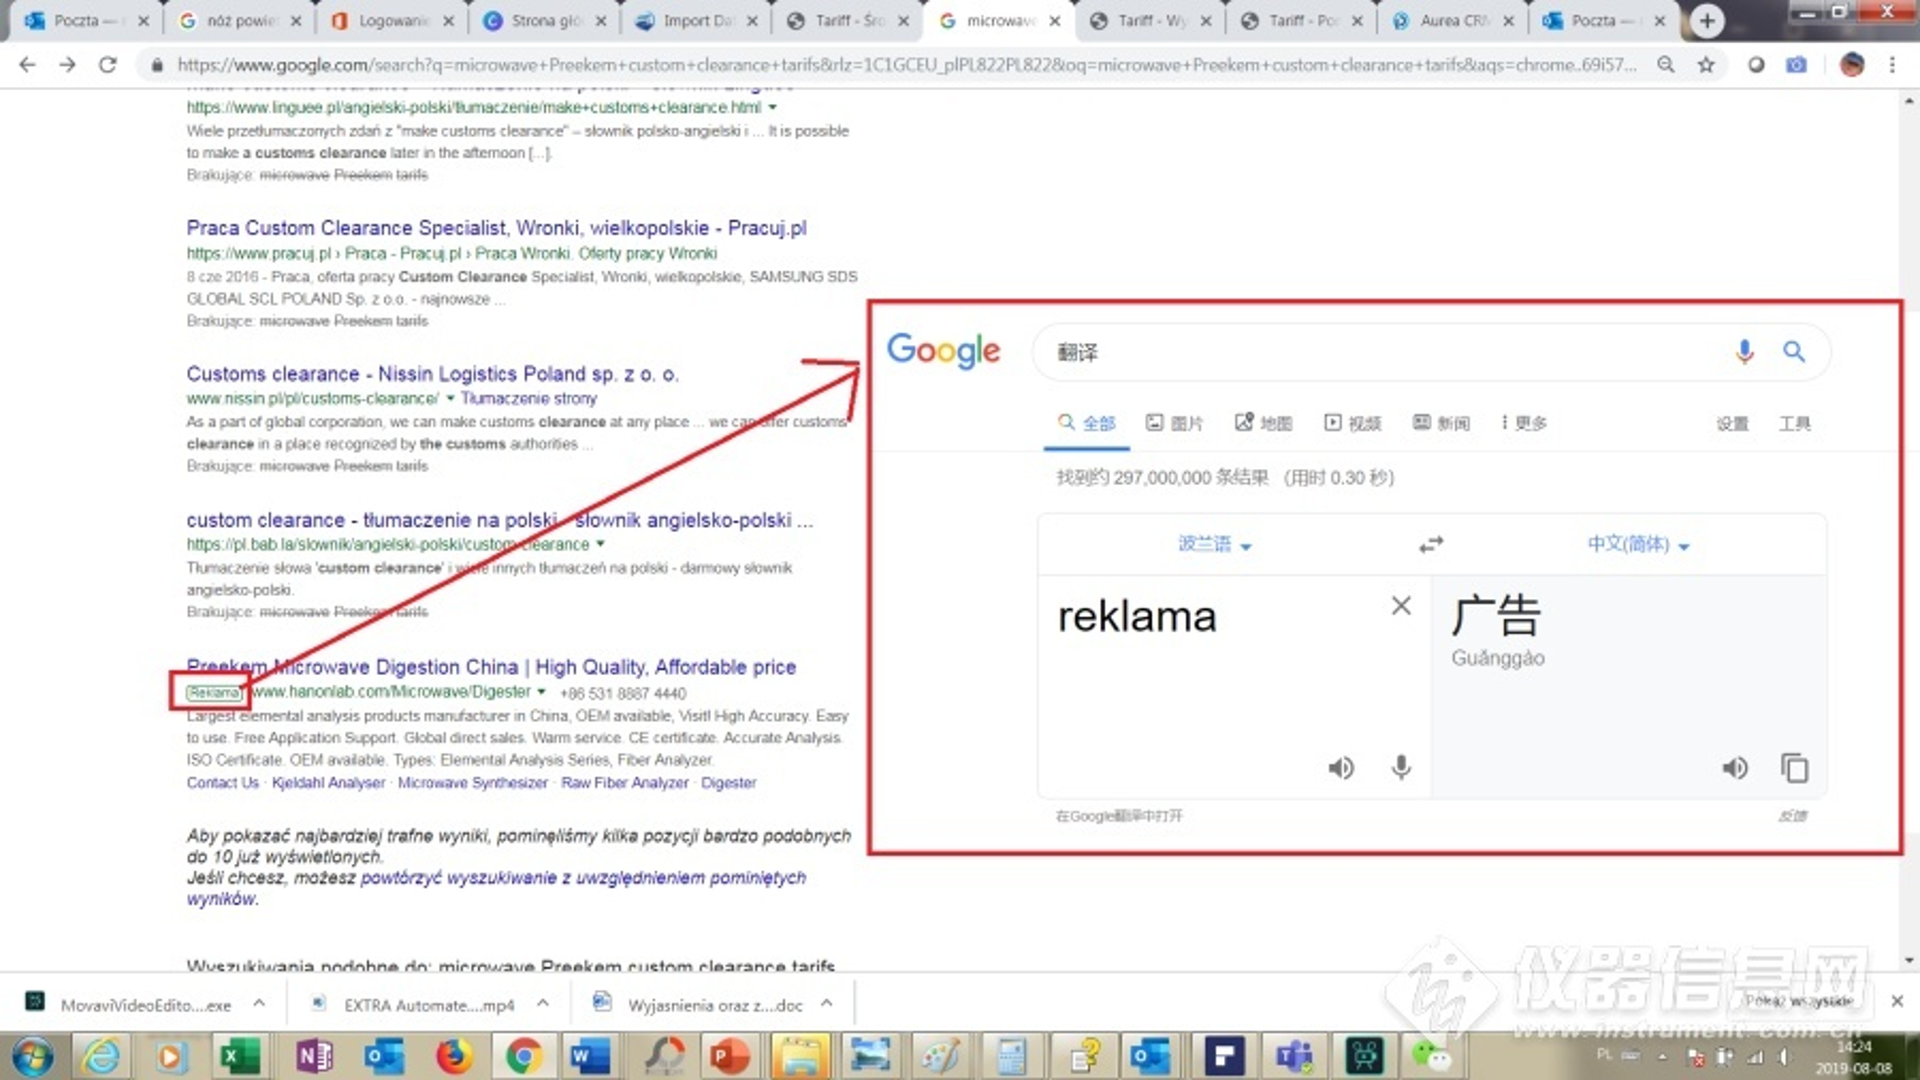 google搜索截图-1-2.png